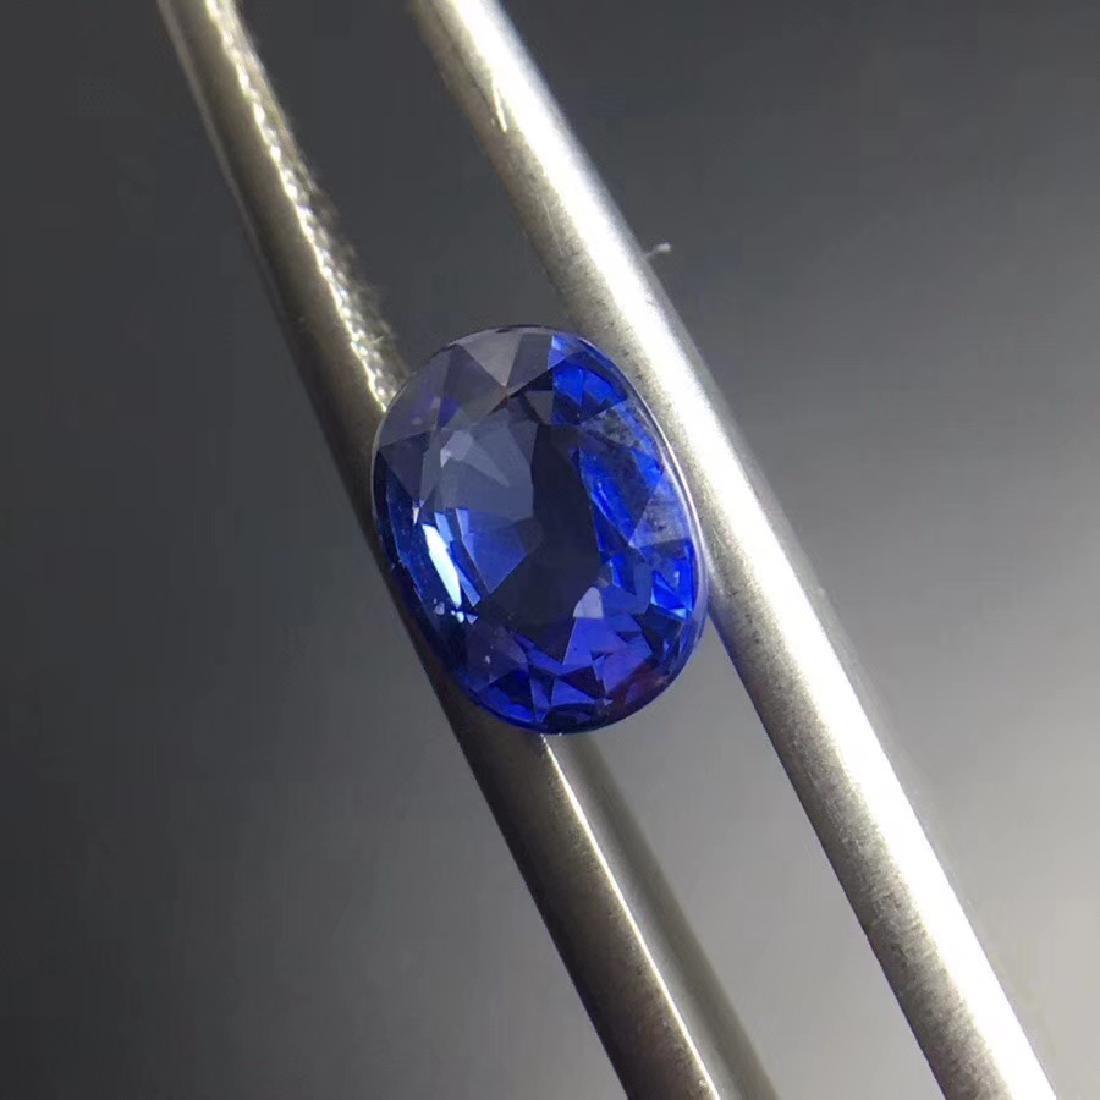 1.52 ct Sapphire 5.7*7.5*3.4 mm Oval Cut - 2